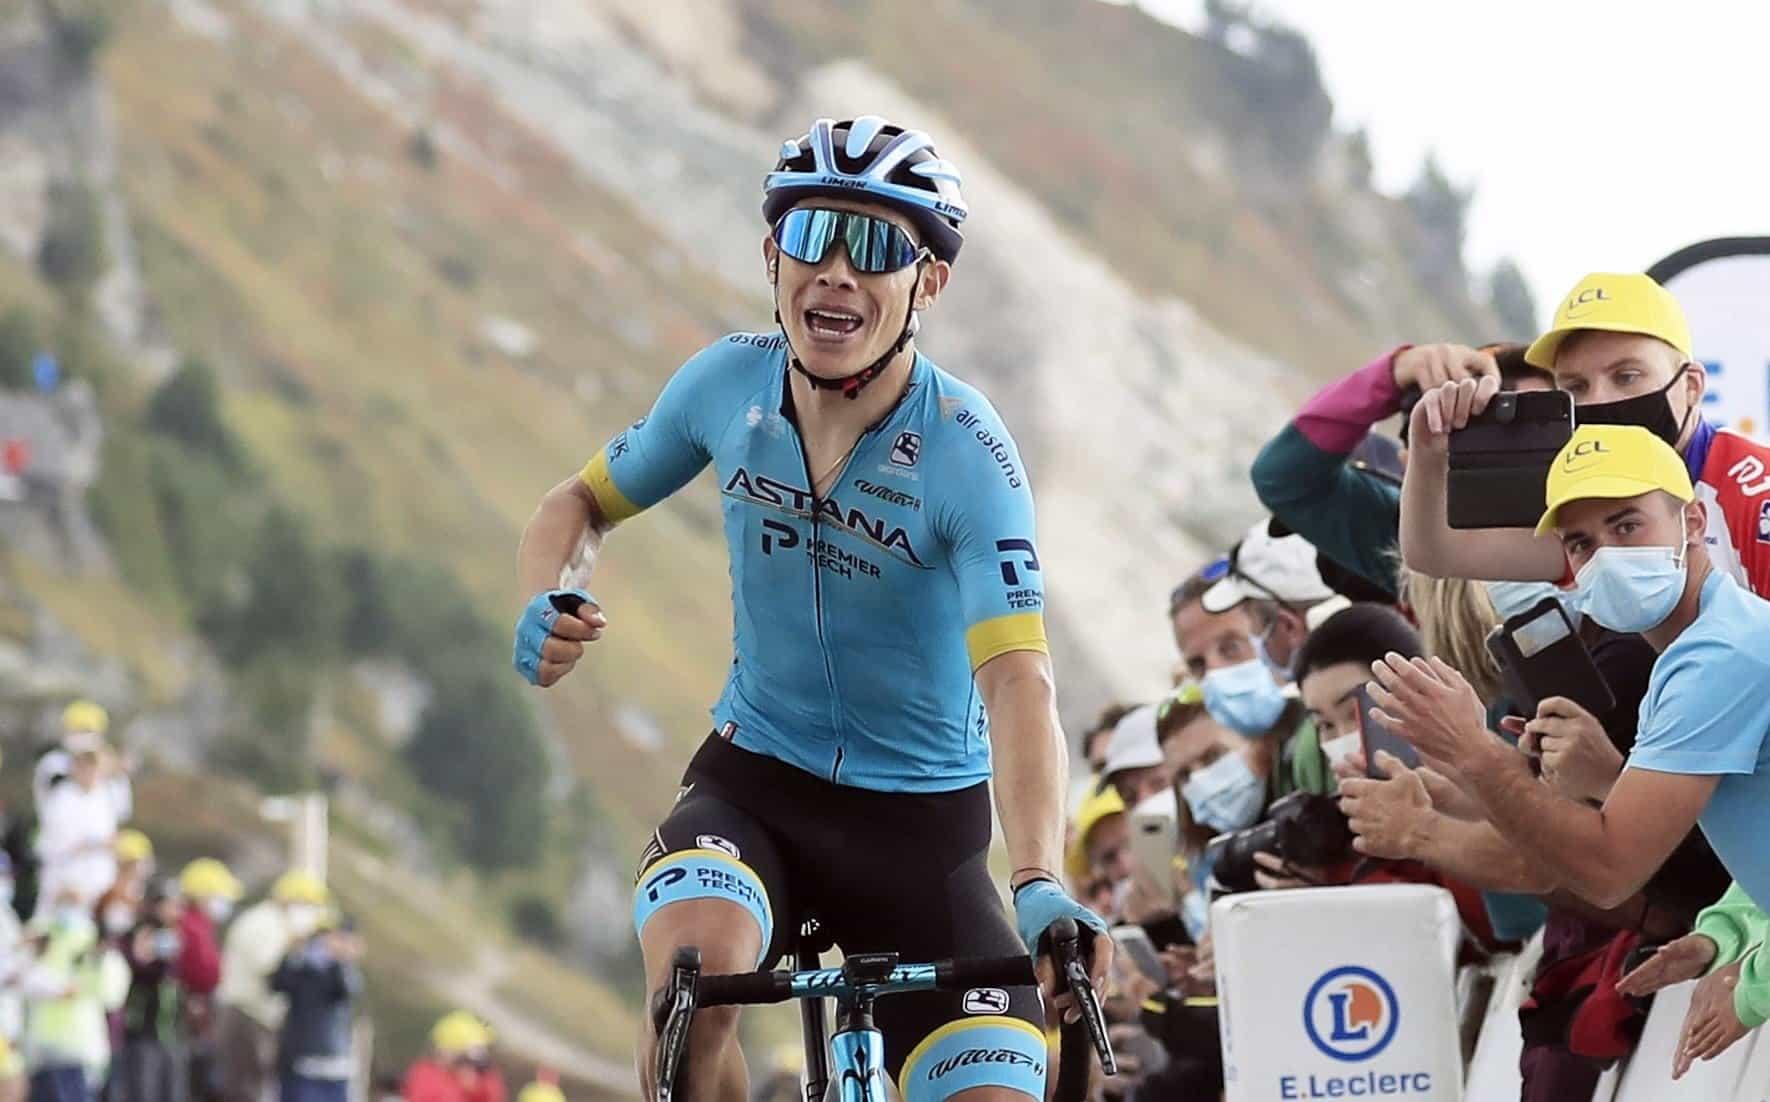 Miguel Ángel López en la etapa 17 del Tour de Francia. Foto: Christophe Petit-Tesson / EFE